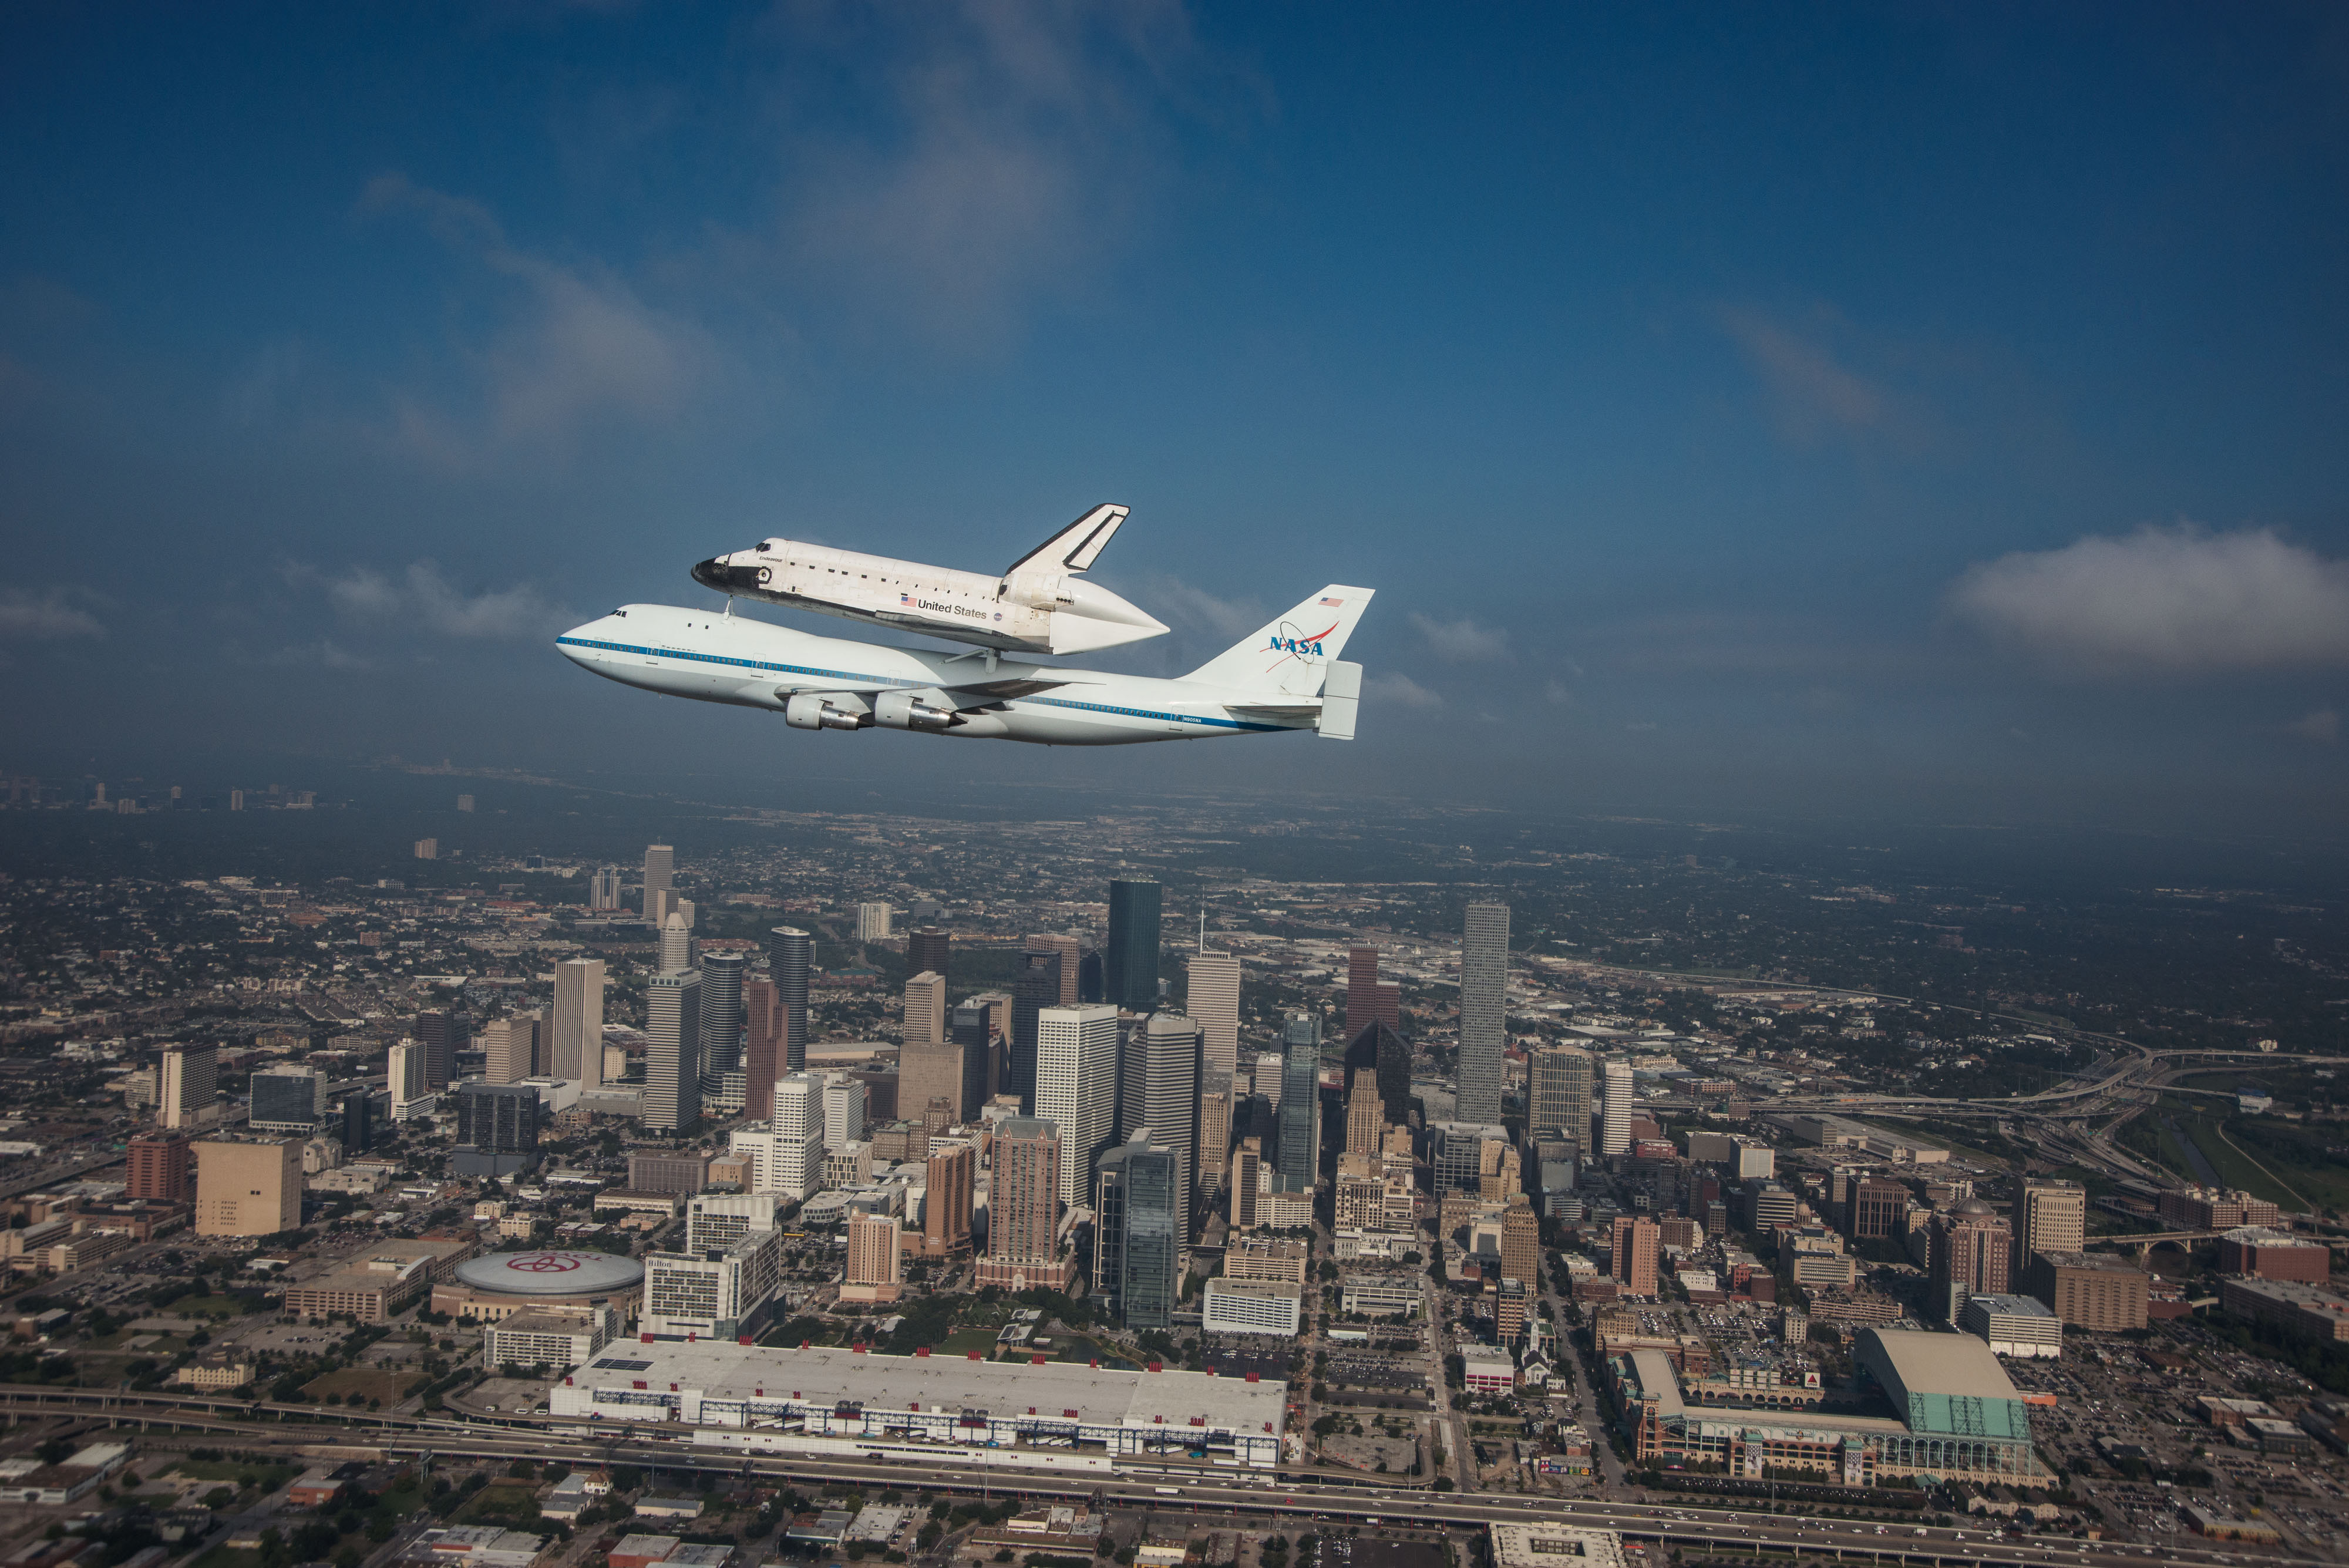 endeavour space shuttle snelheid - photo #22